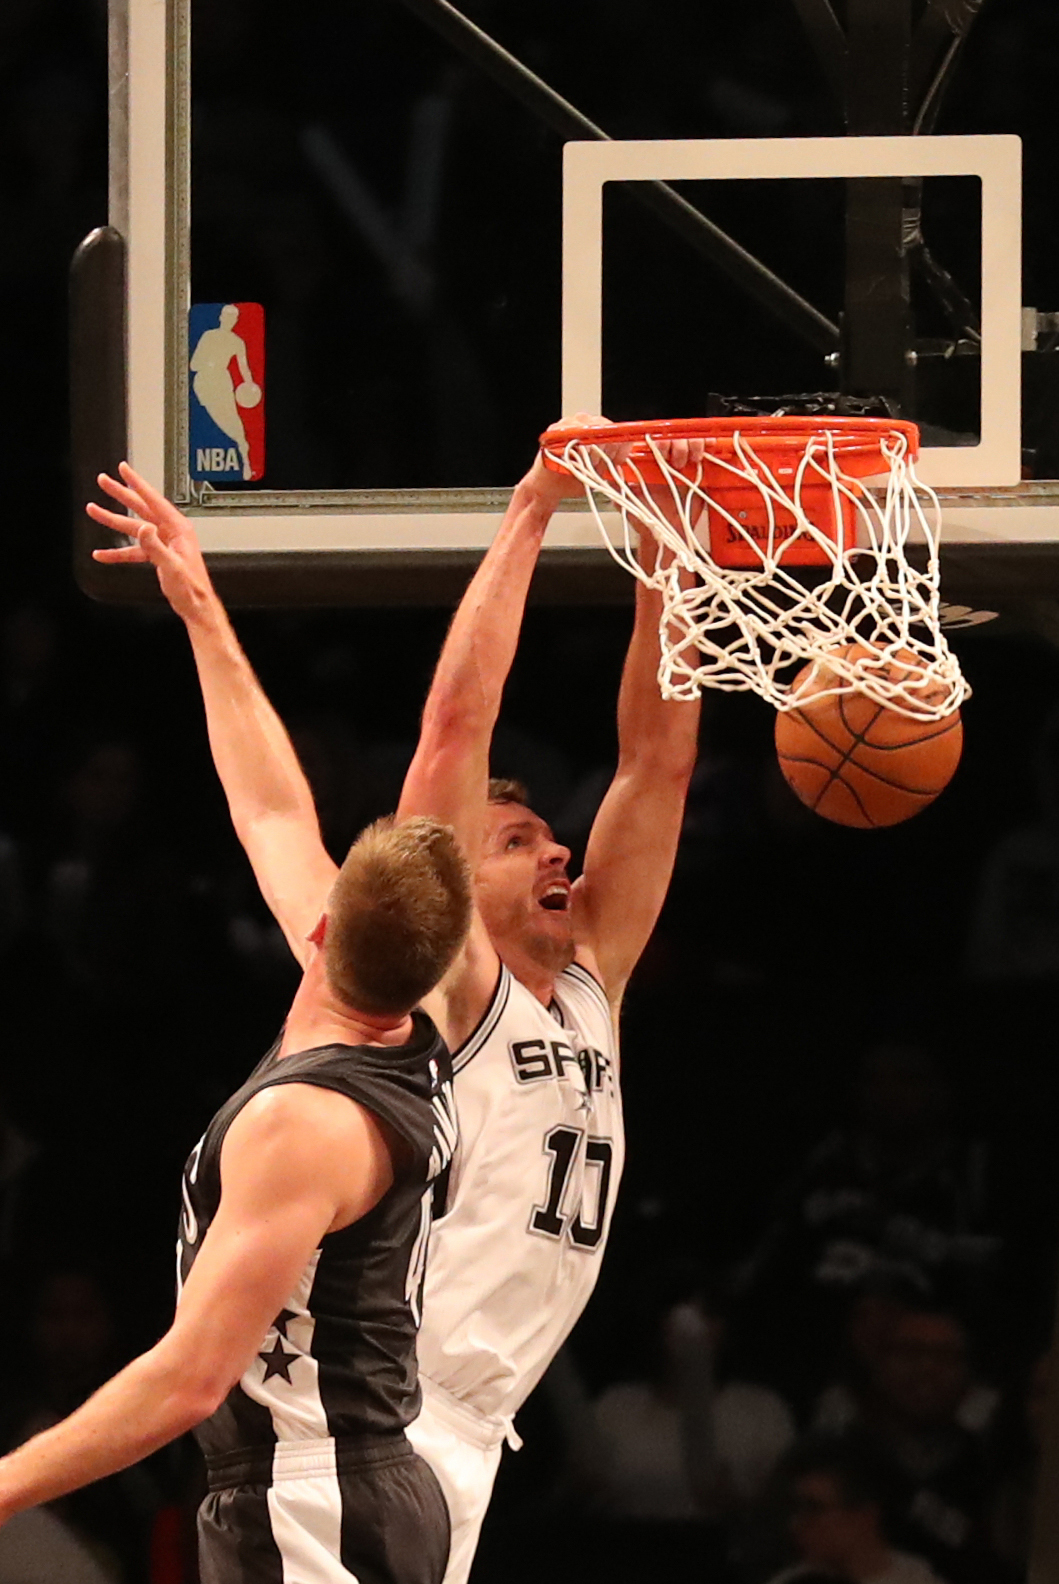 NBA: San Antonio Spurs at Brooklyn Nets